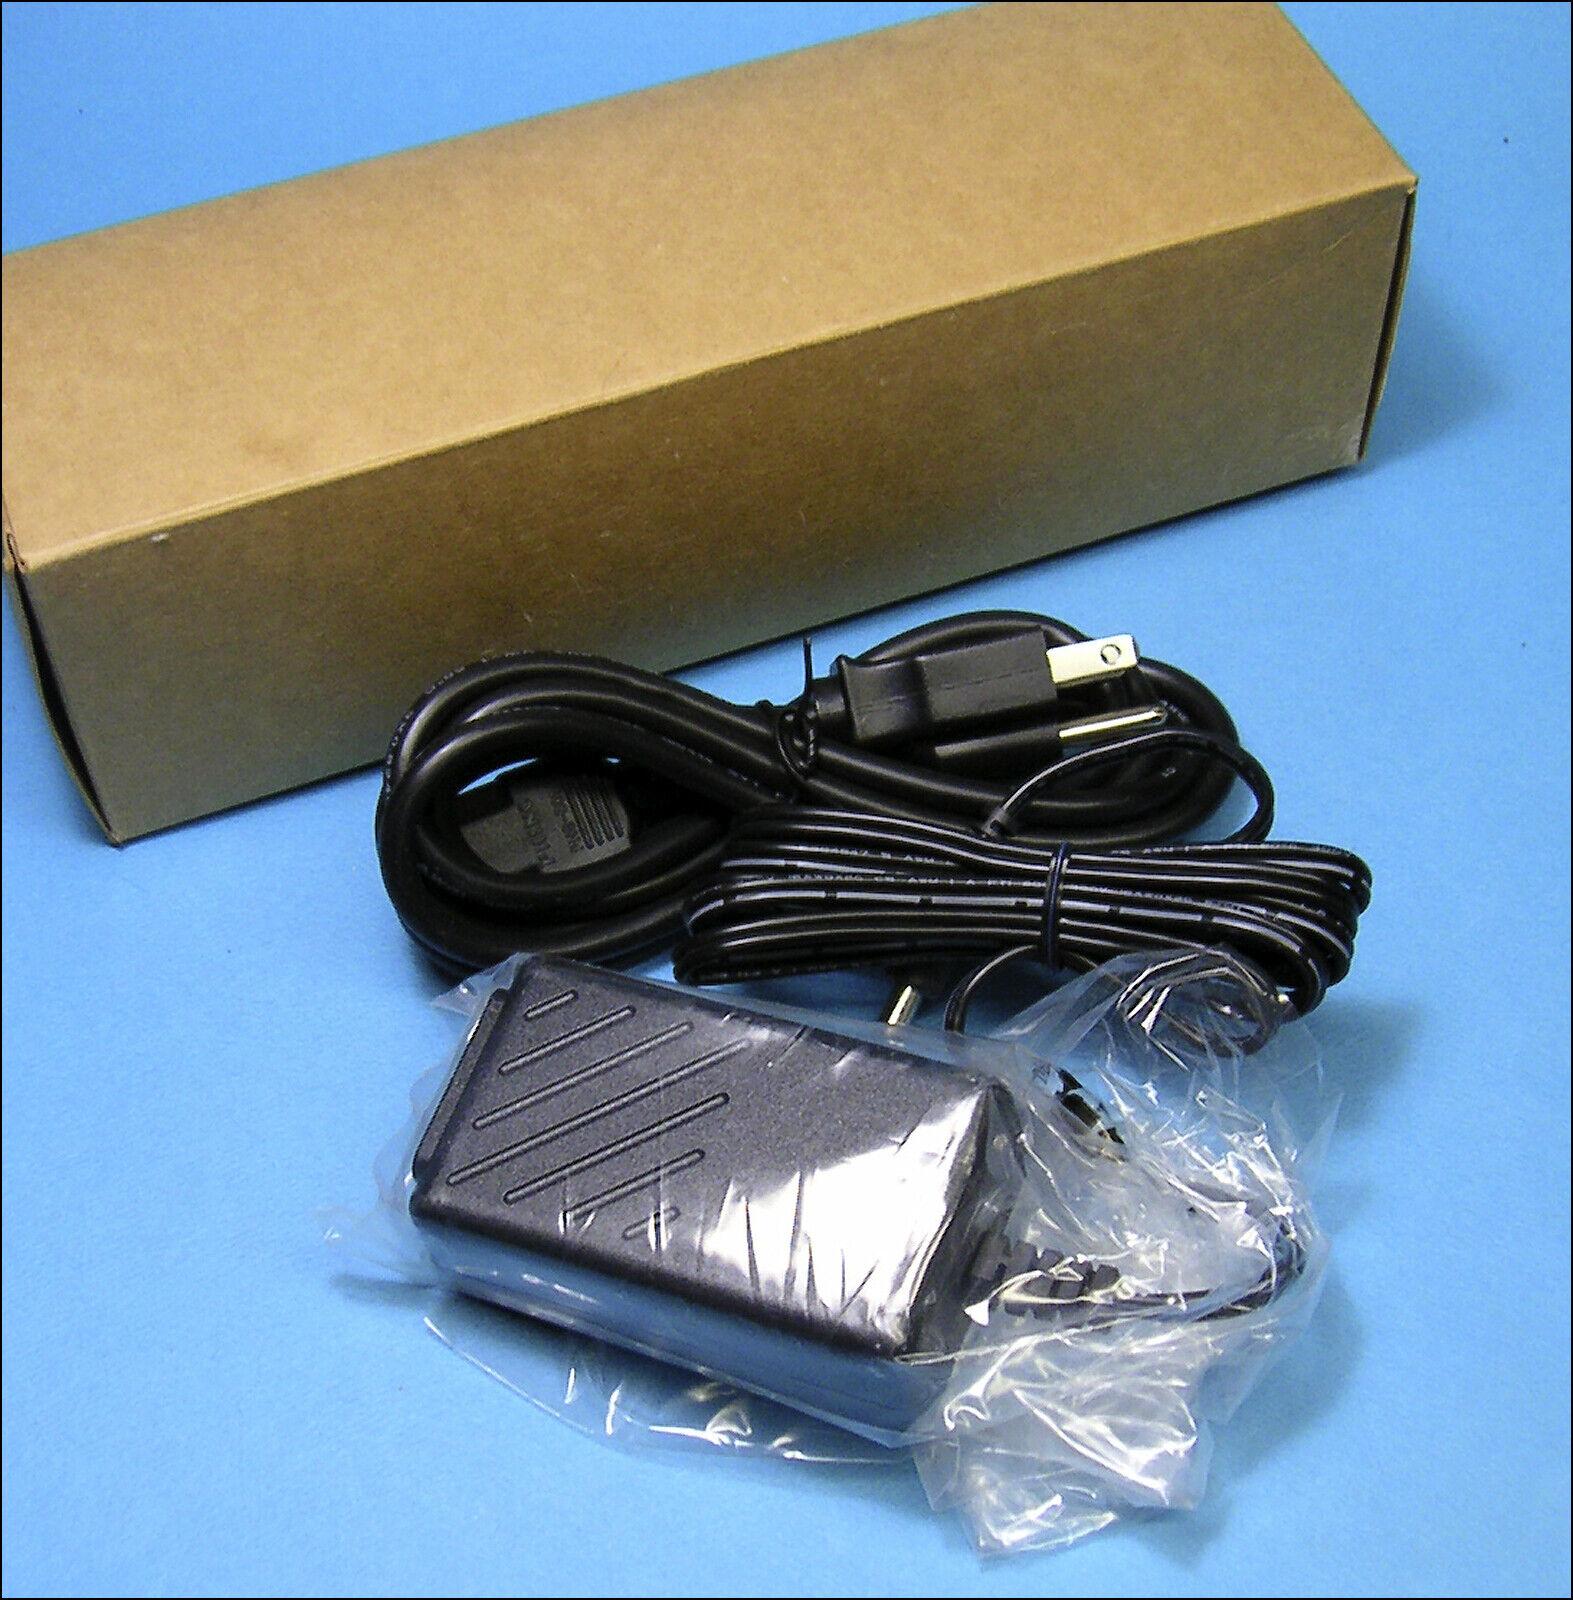 Switching Power Supply ELPAC FW1812 12V 1.5A 18W - $6.99